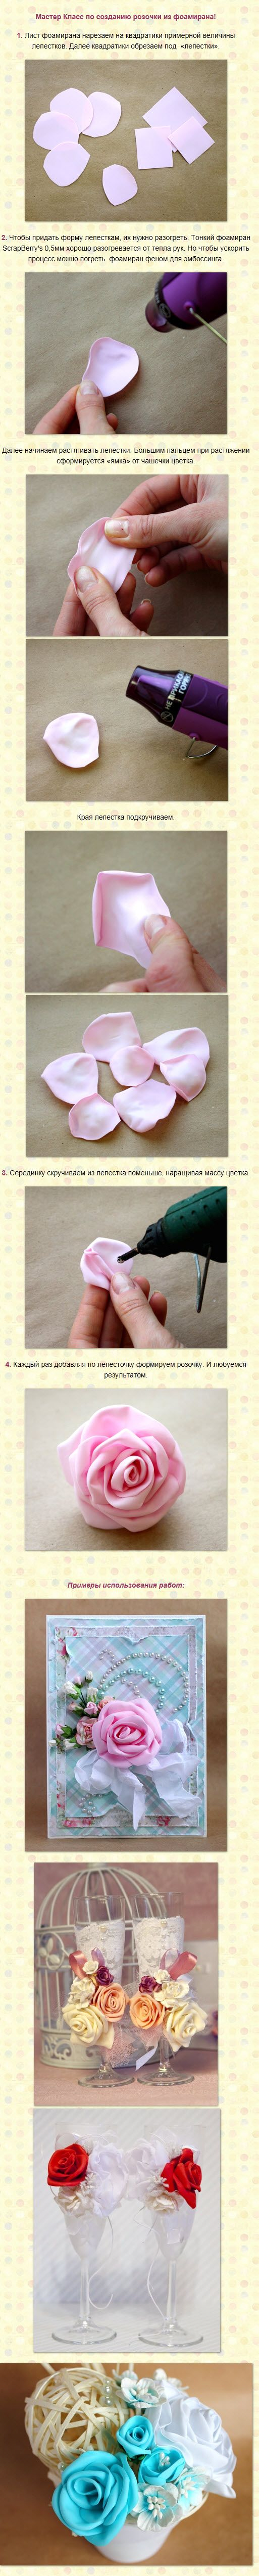 Мастер-класс роза из фоамирана - Nebka.Ru